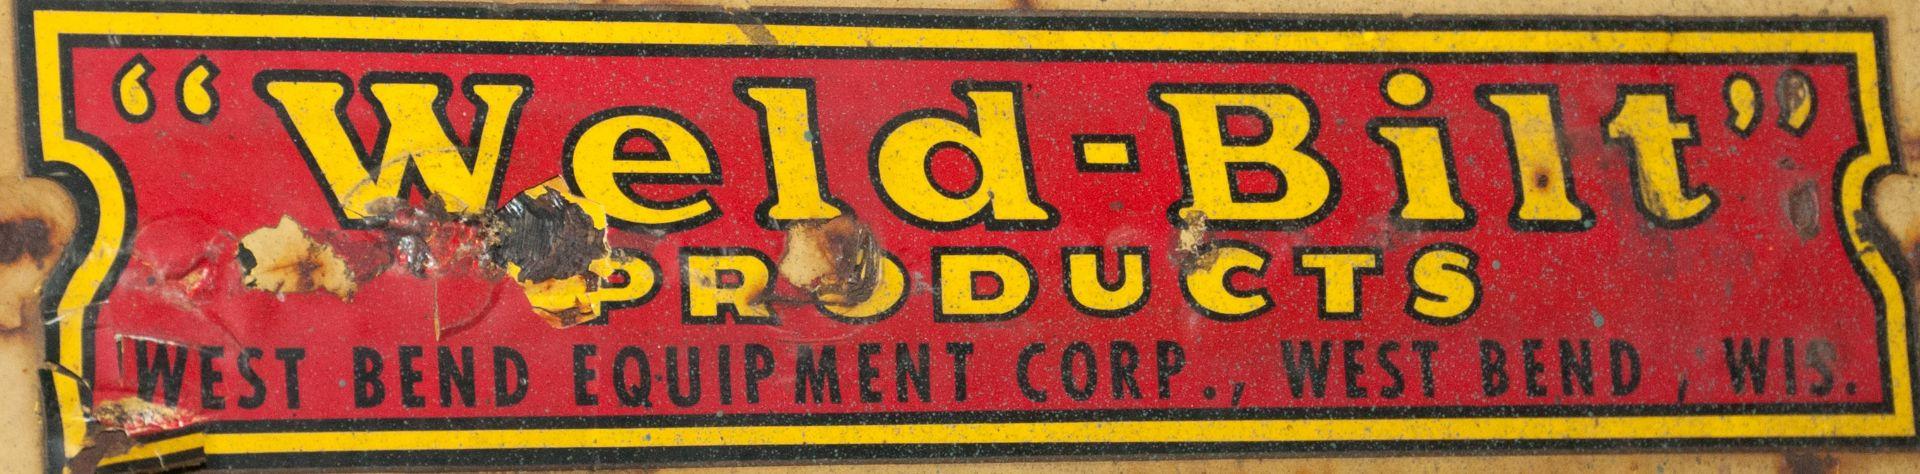 Weld-Bilt 8000 lb Cap. Pallet Hook for Crane - Image 2 of 3